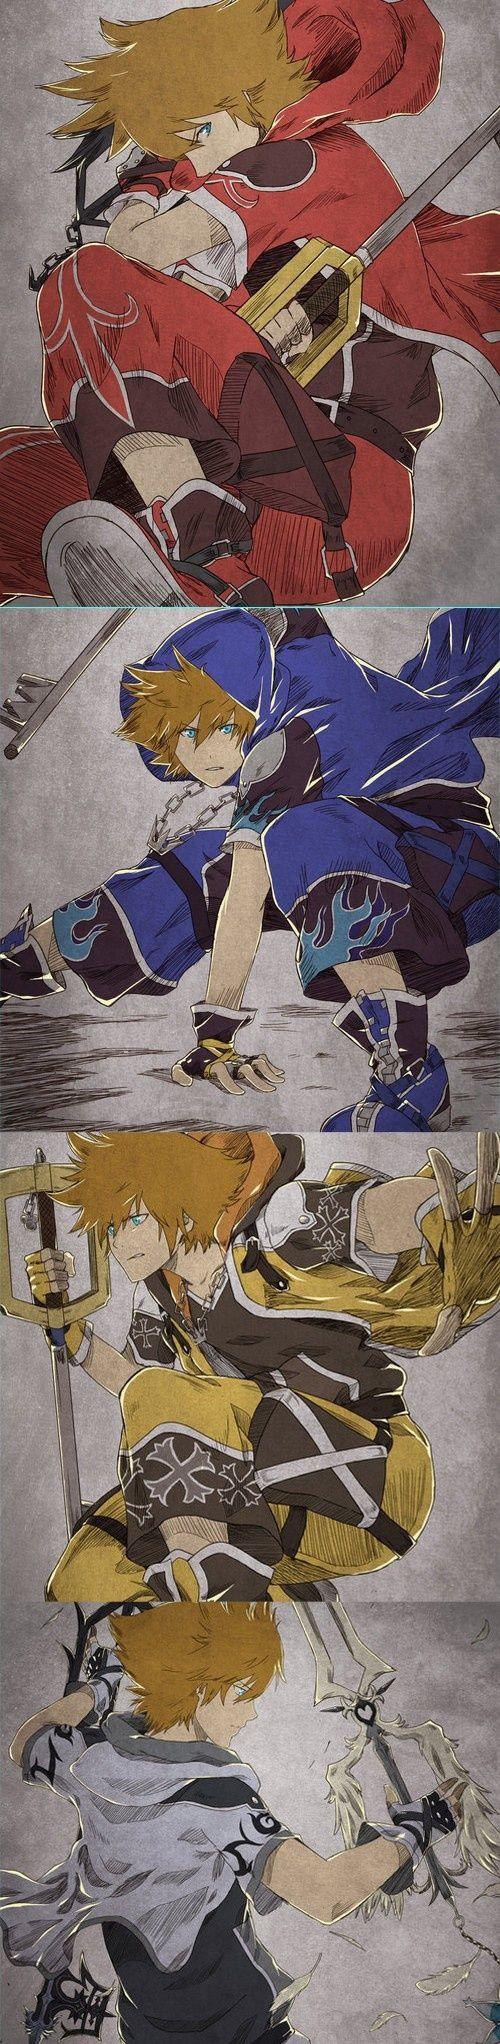 Sora Limits Version - Kingdom Hearts